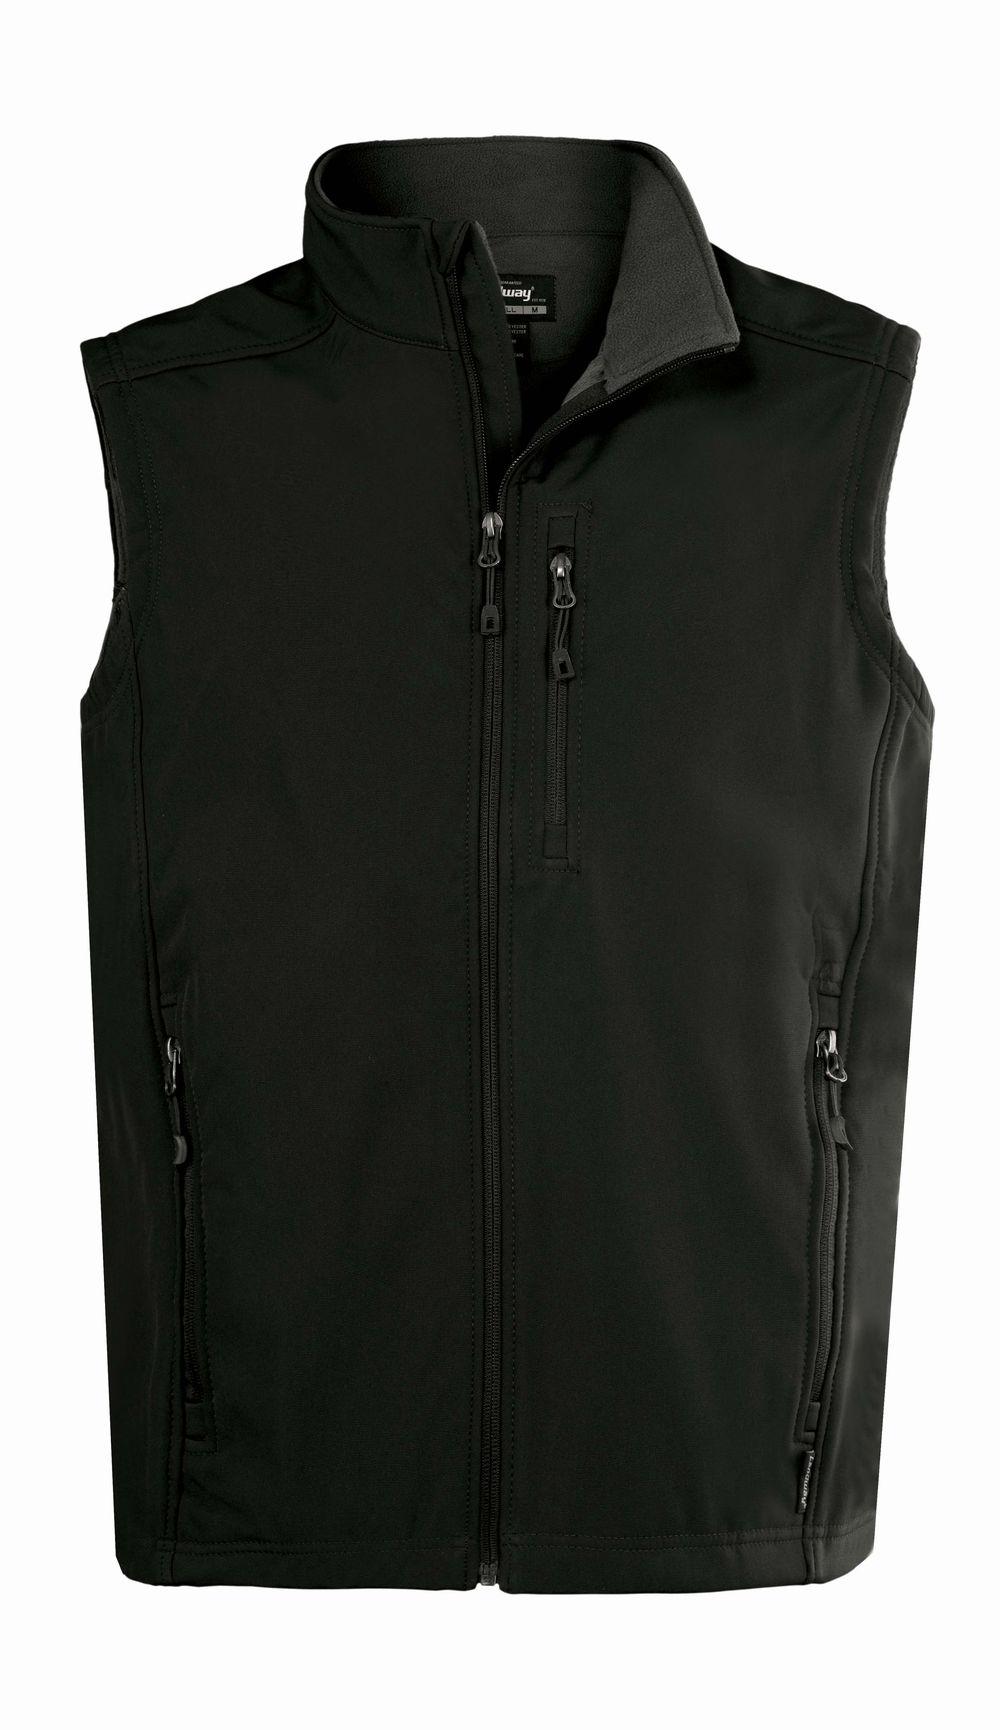 Landway 9905 - Neo Soft-Shell Vest